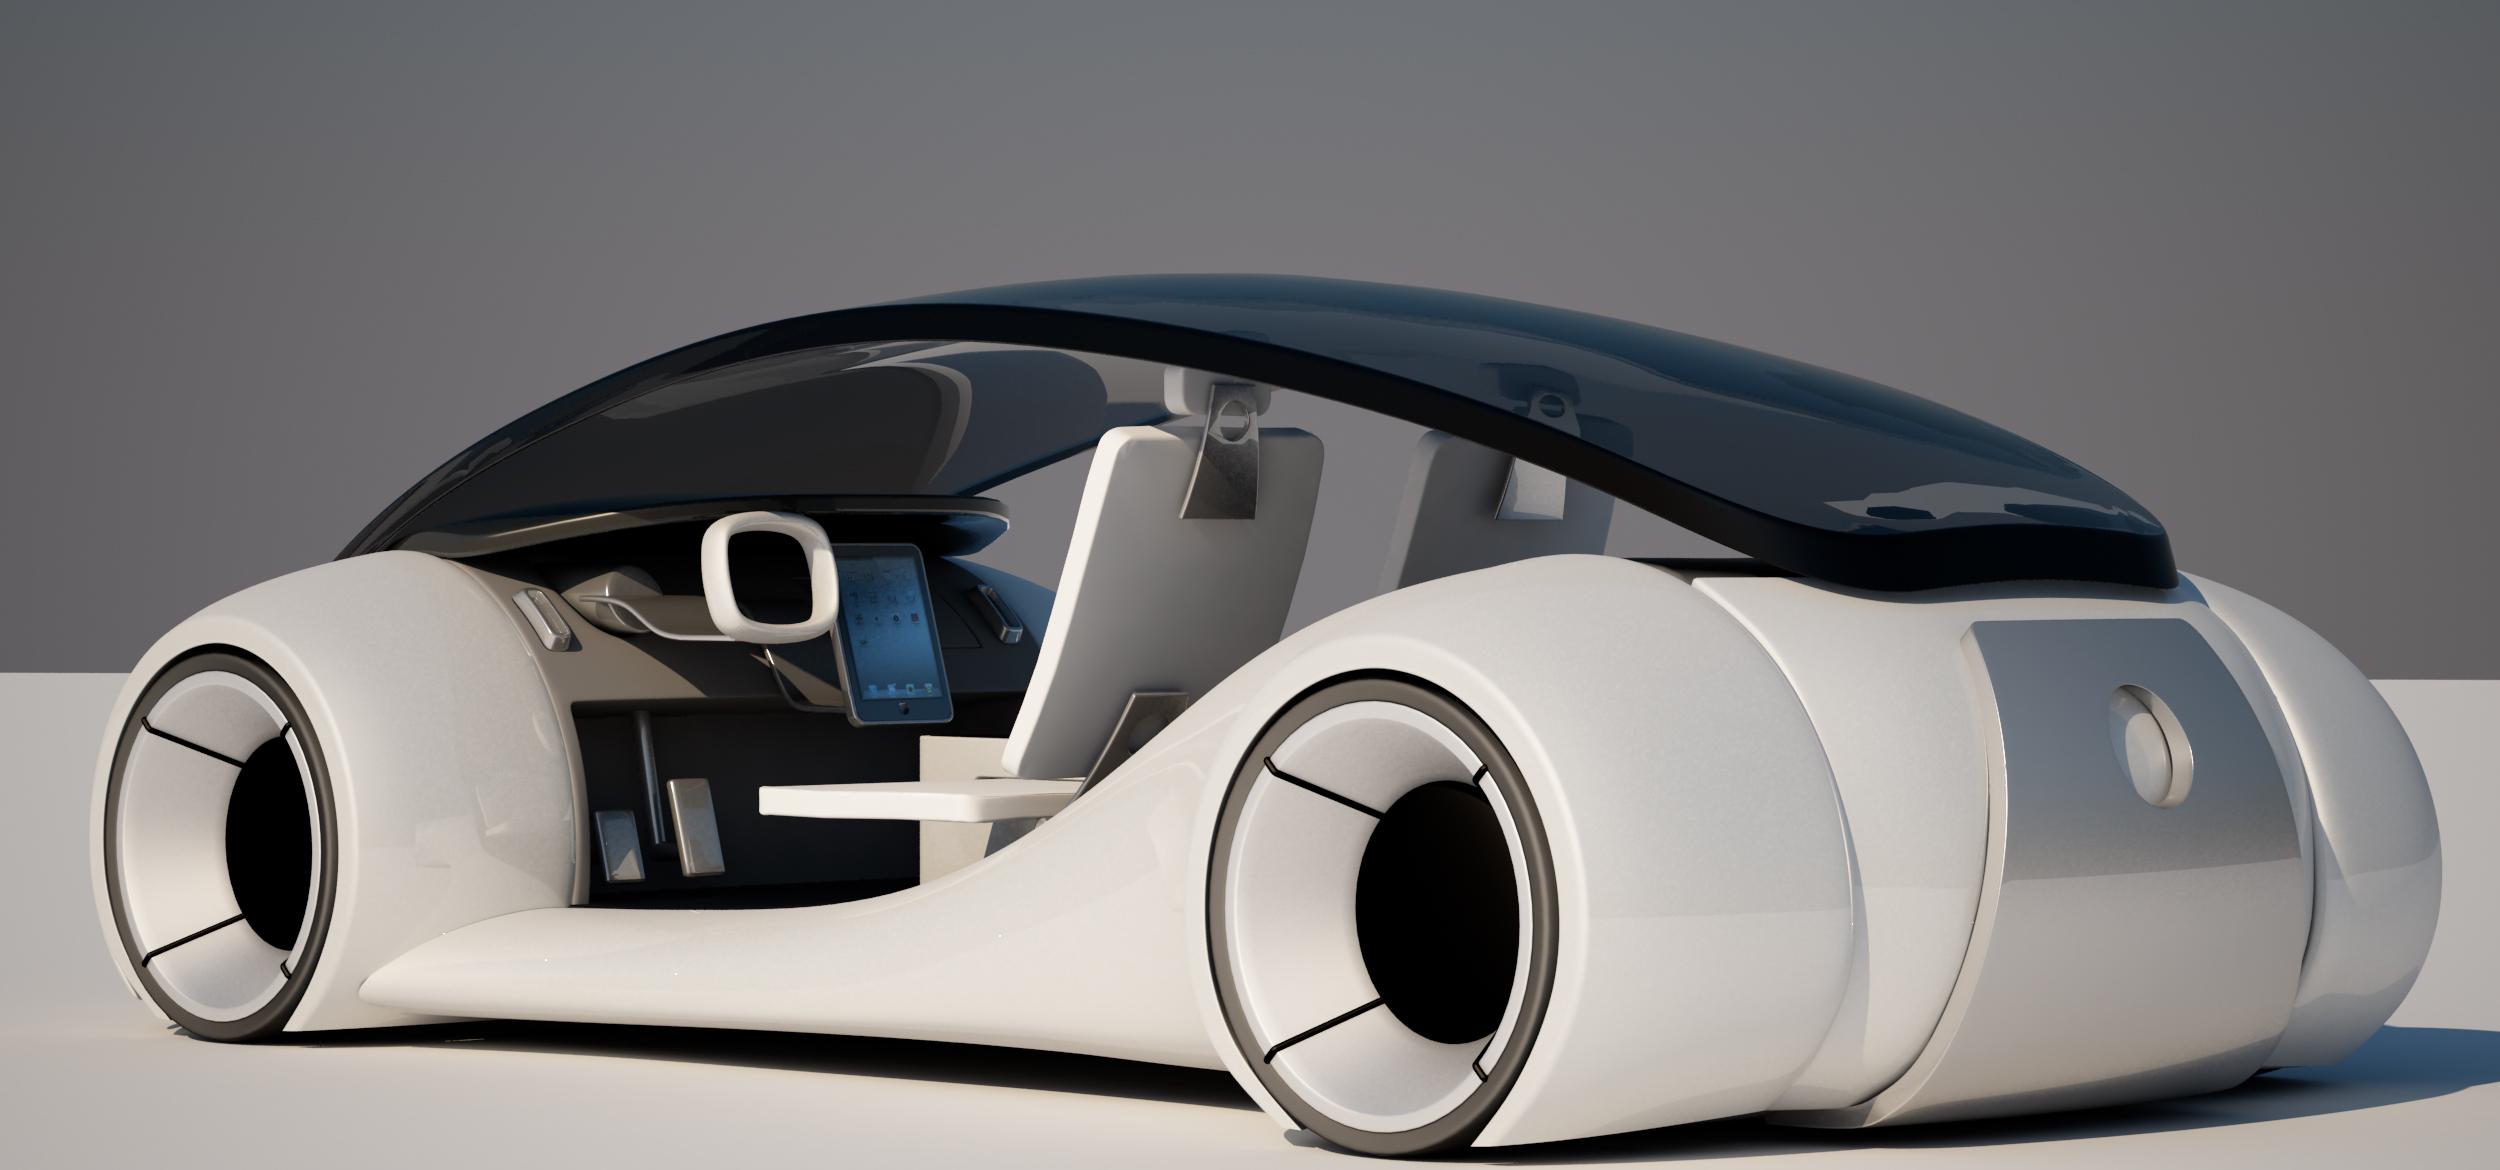 Car Design ICar By Franco Grassi At Coroflot